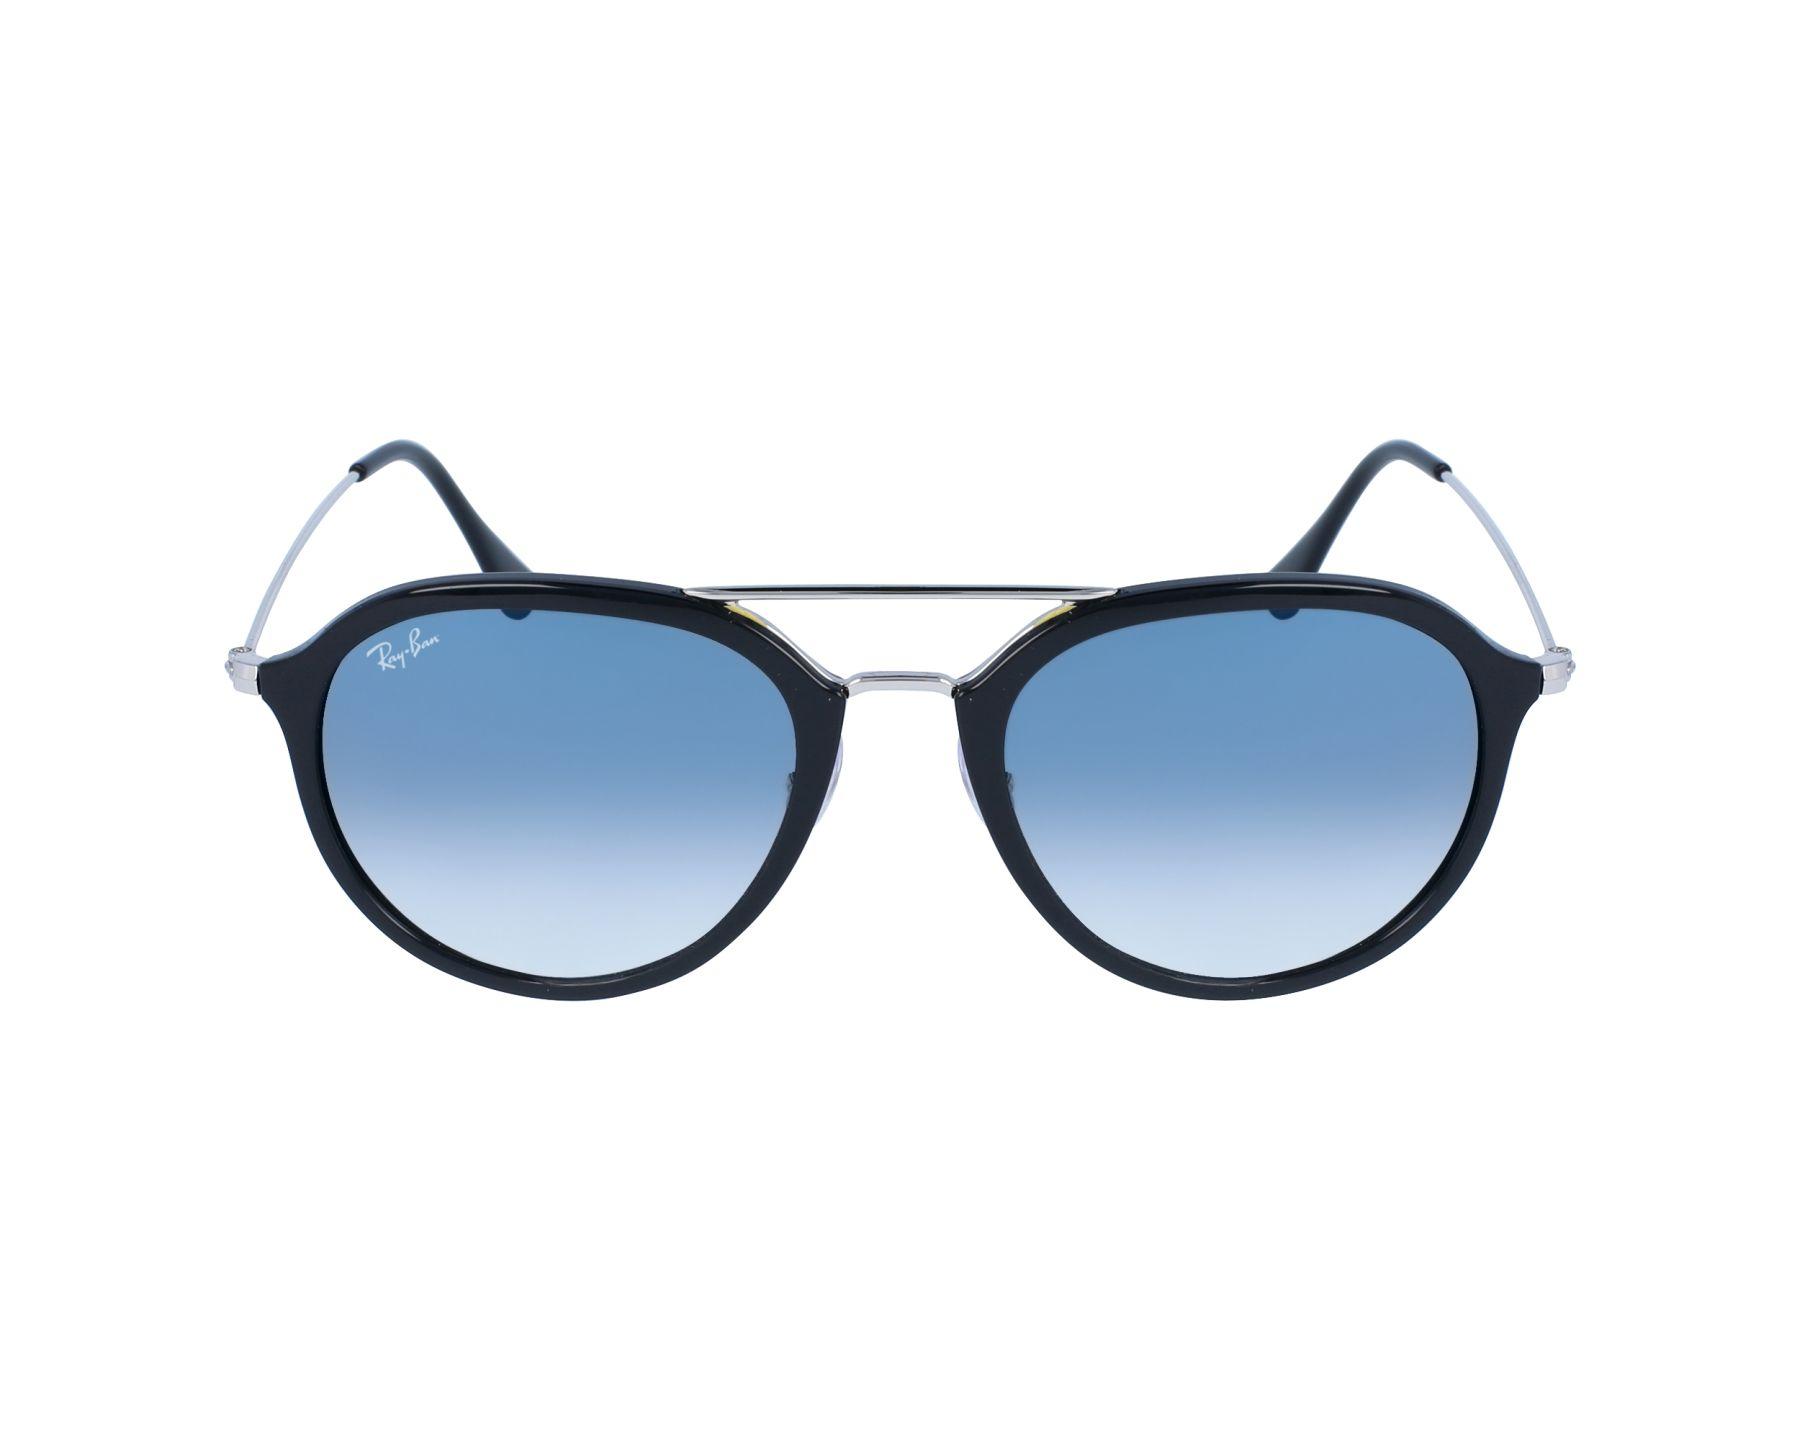 e8b33136ae Sunglasses Ray-Ban RB-4253 62923F 53-21 Black Silver profile view